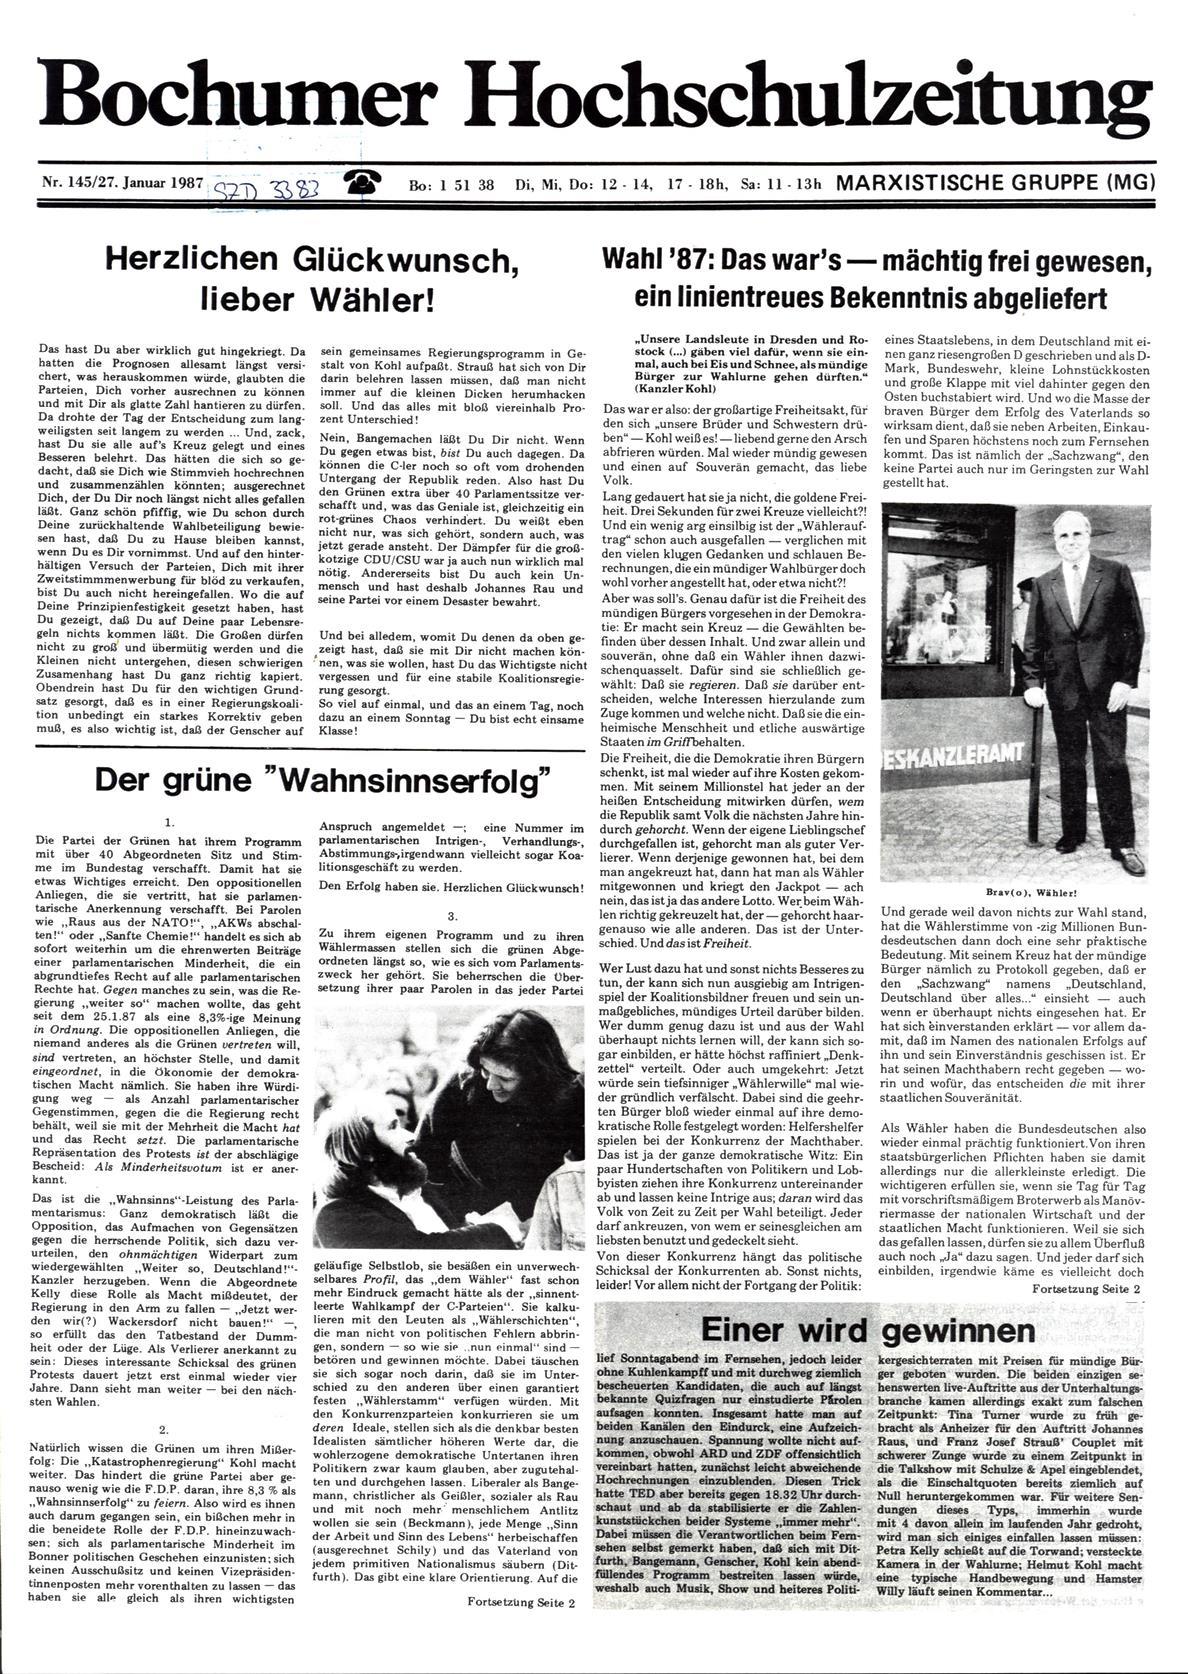 Bochum_BHZ_19870127_145_001